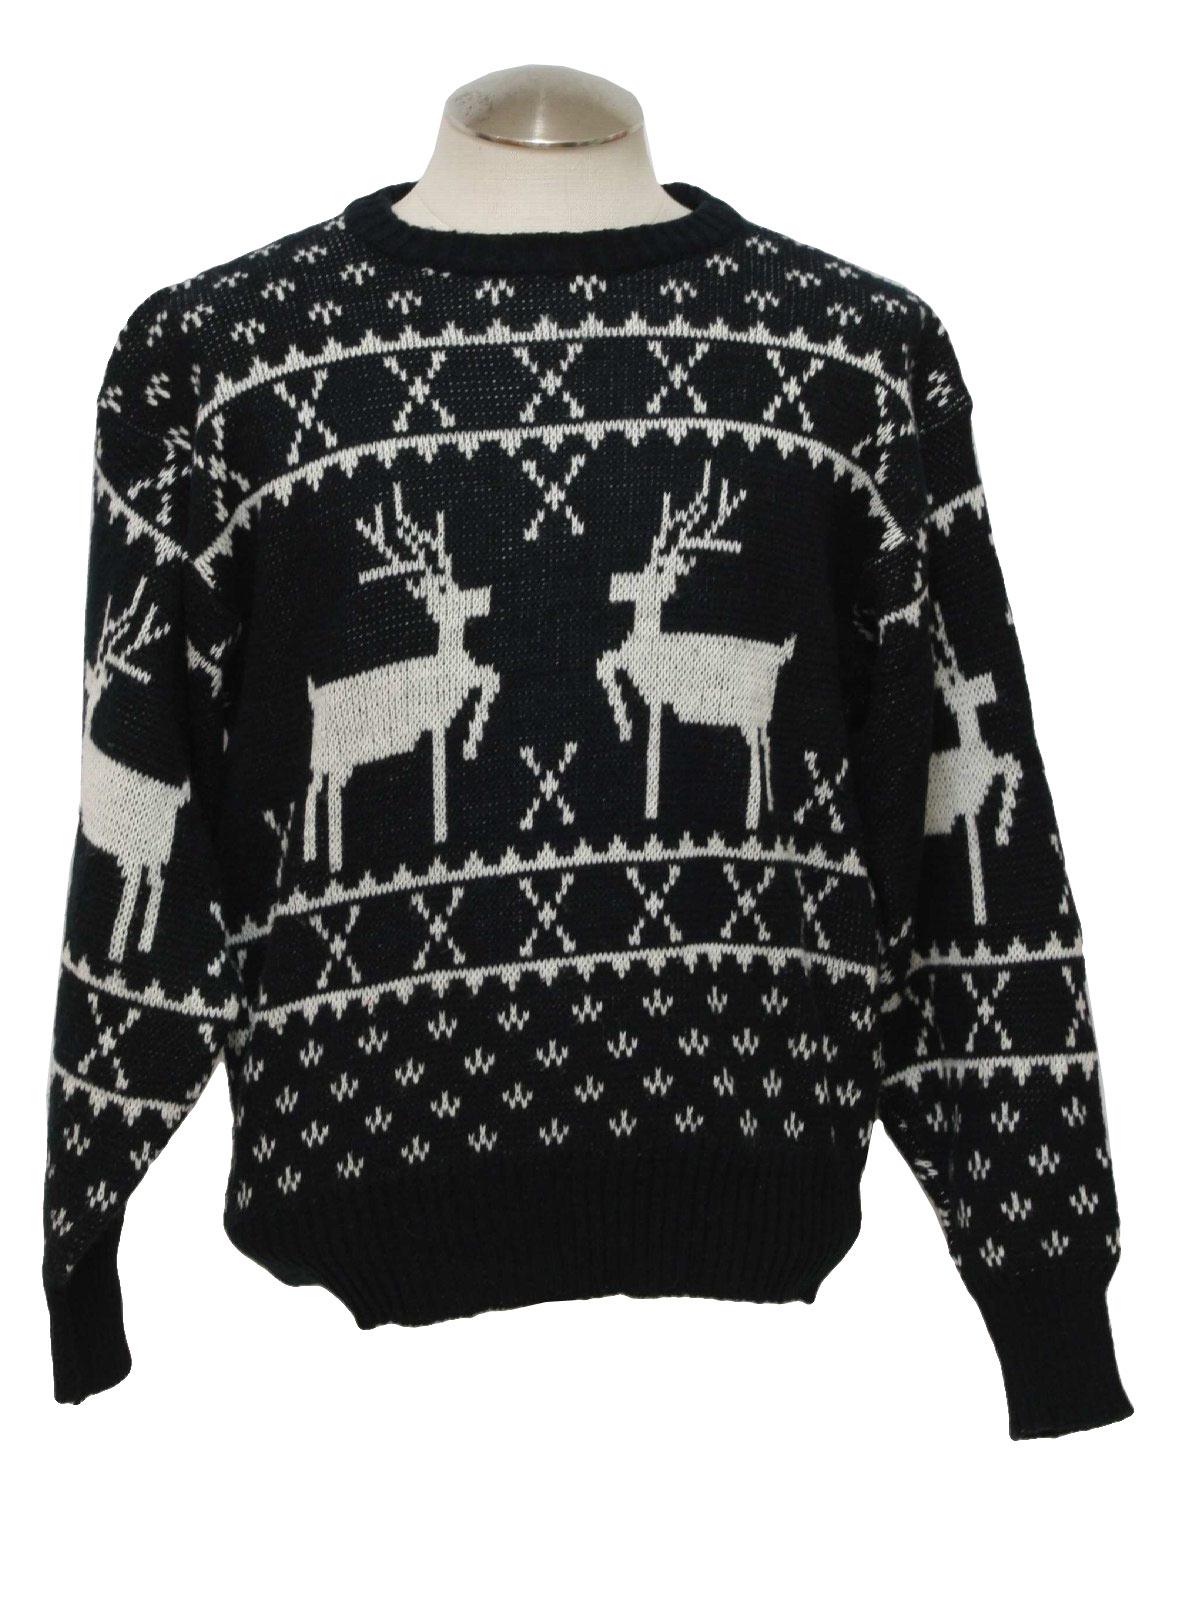 You're in Men's Sweaters / Vests